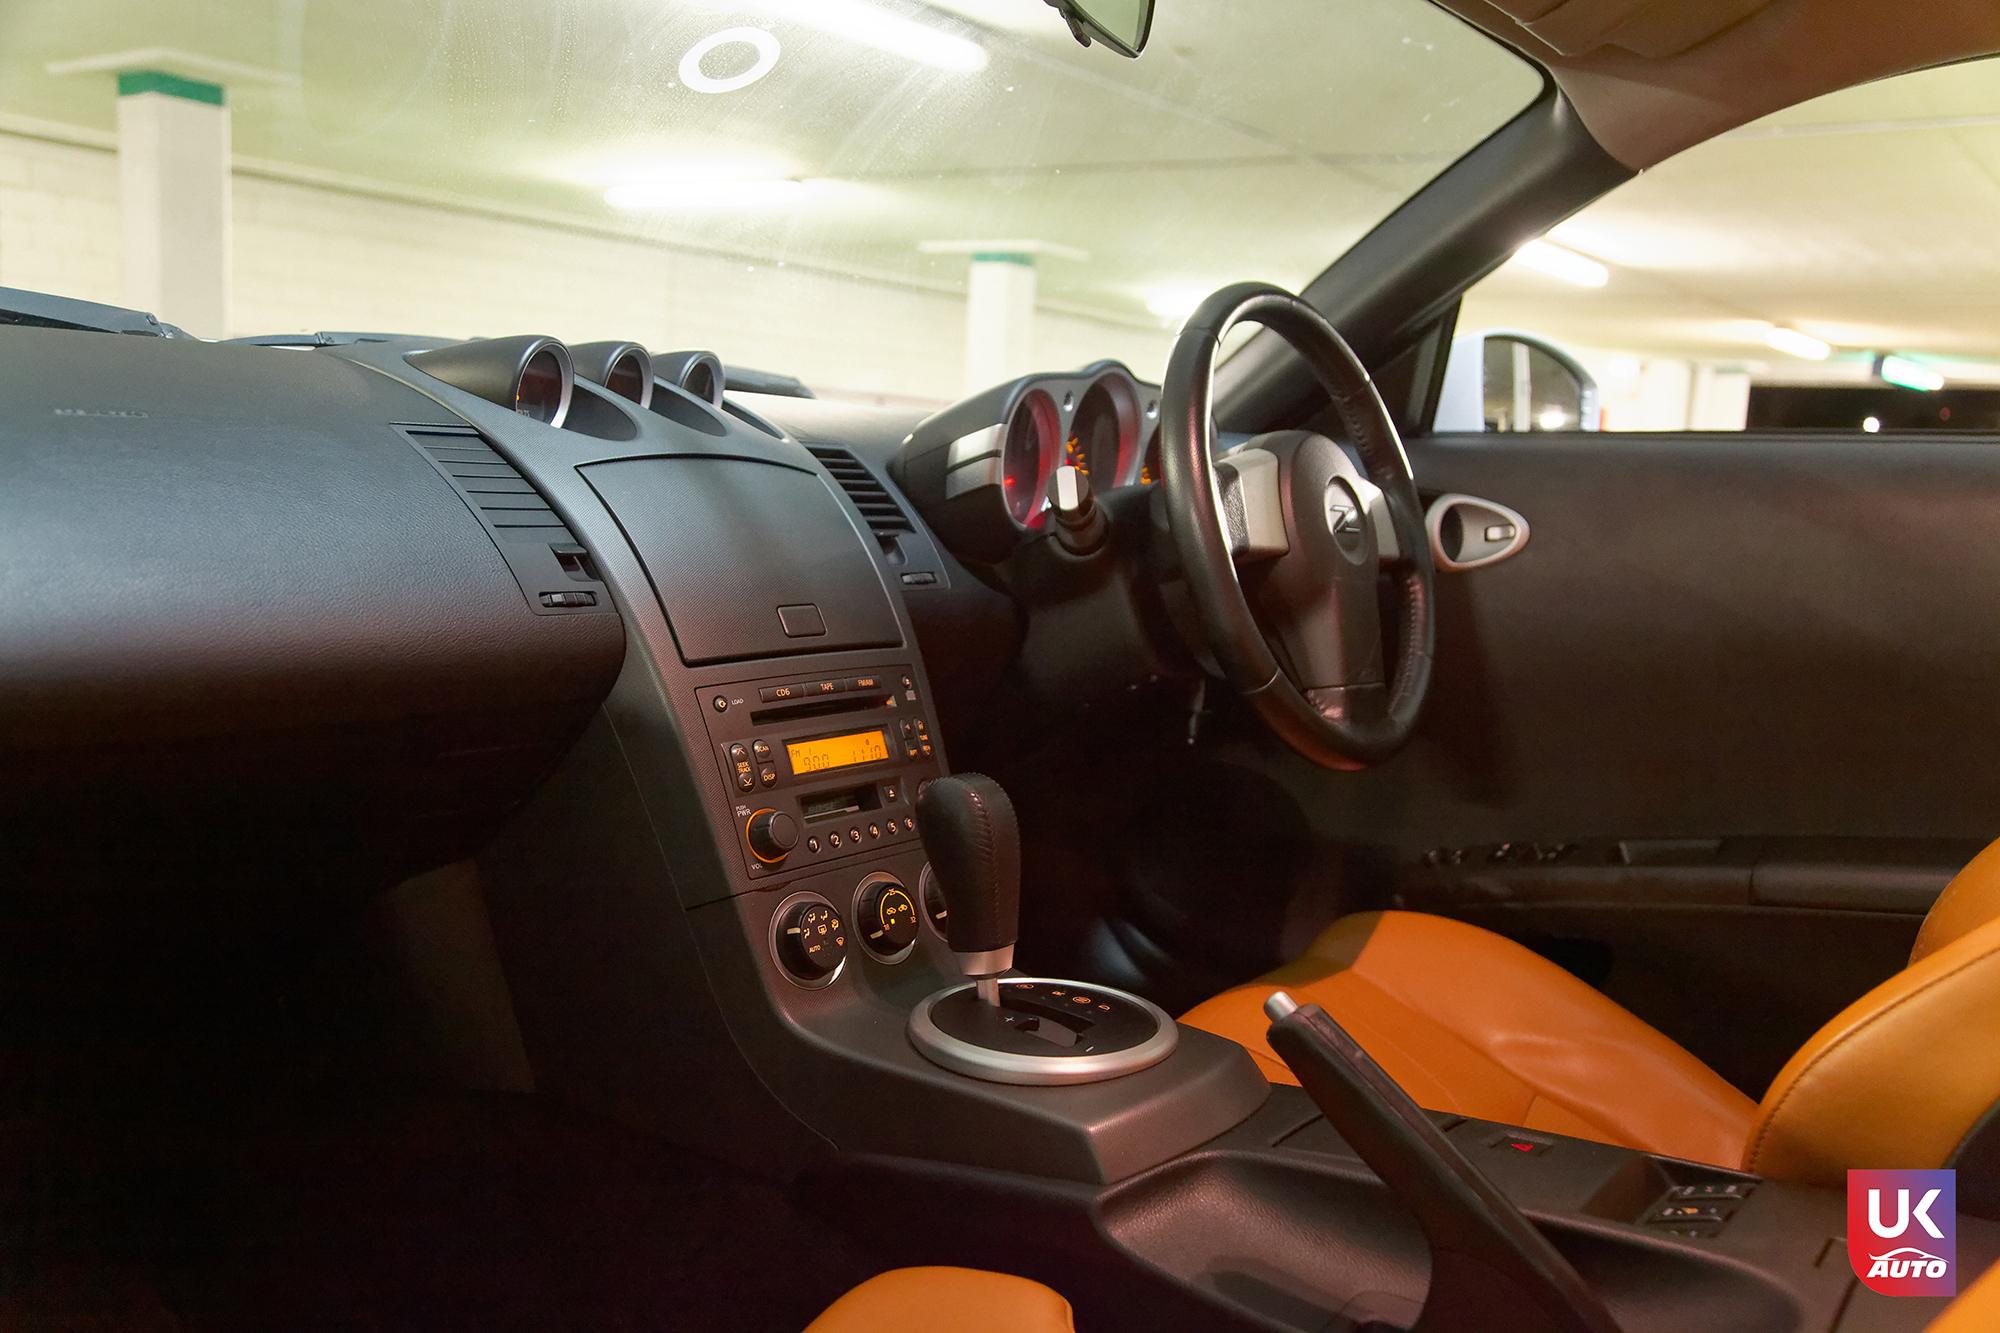 Ukauto import nissan 350z jdm import fairlady v6 import uk ukauto rhd nissan import uk6 - Import Nissan 350Z JDM IMPORT 3.5 V6 TIPTRONIC IMPORT AUTO par UKAUTO